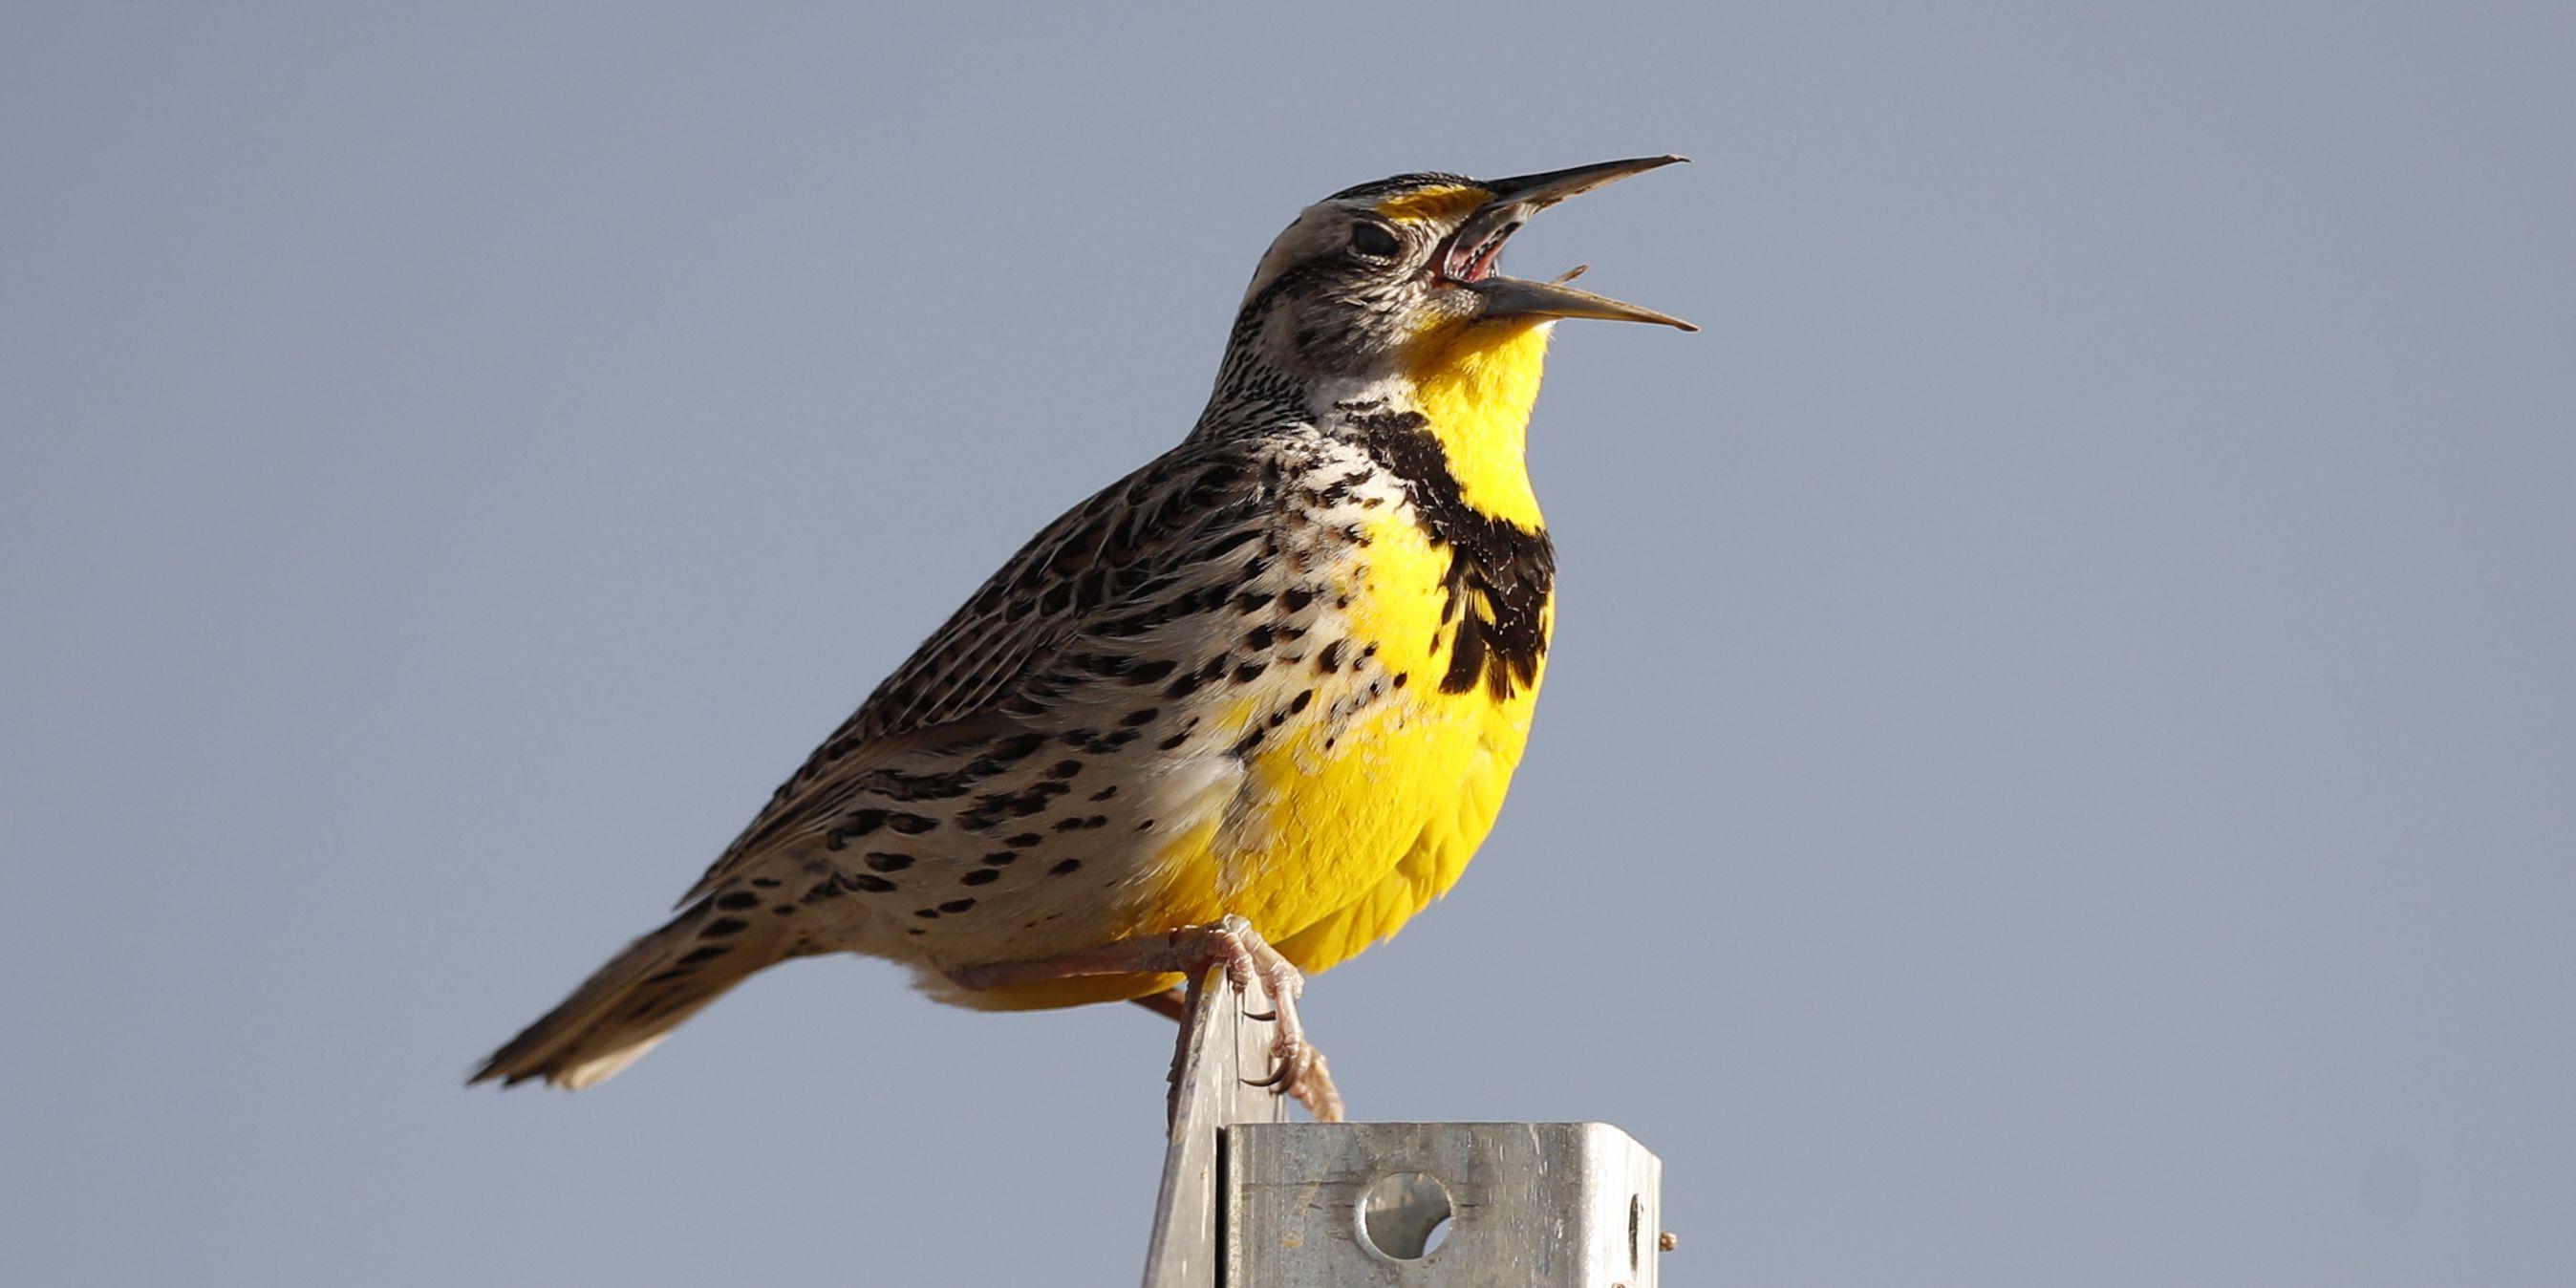 Where have the wild birds gone? 3 billion fewer than 1970